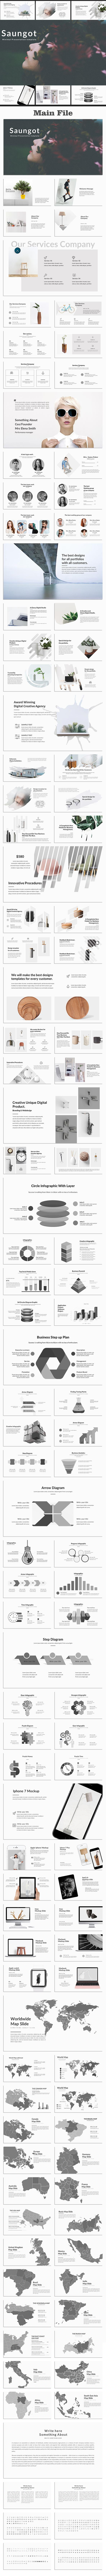 Saungot Minimal Google Slide Template - Google Slides Presentation Templates